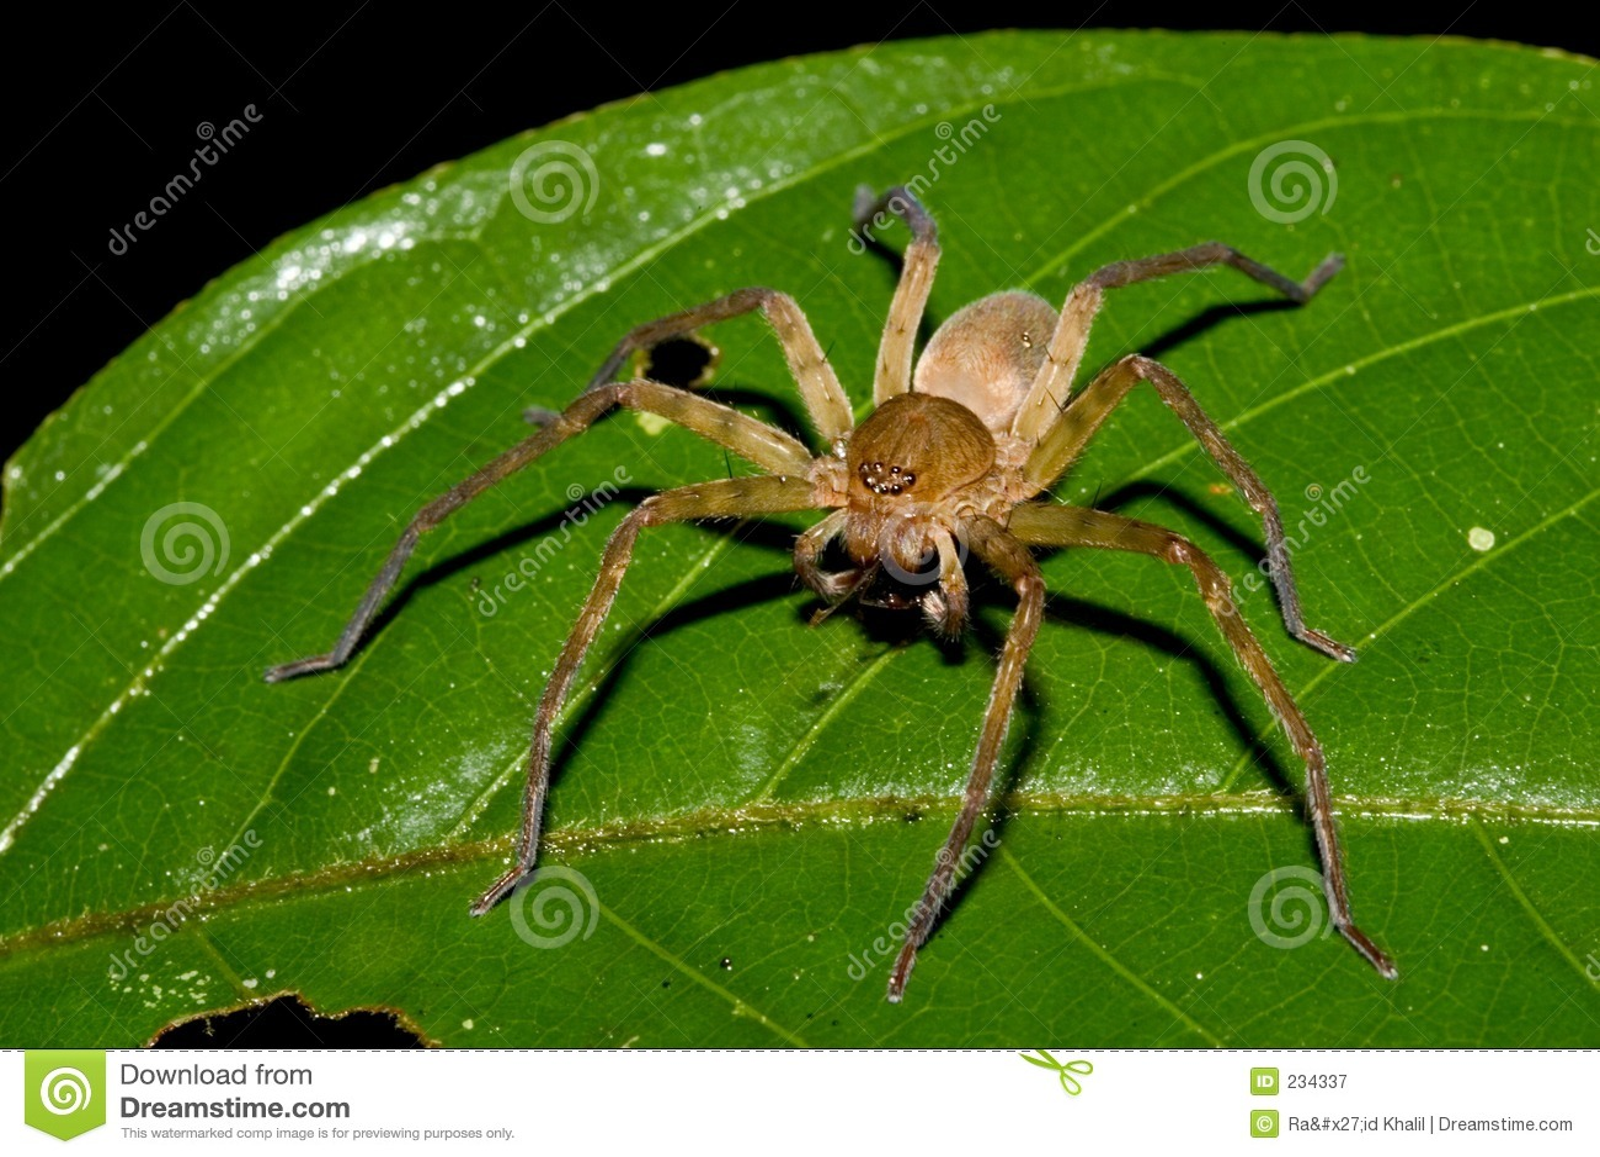 Spider-Ecuador